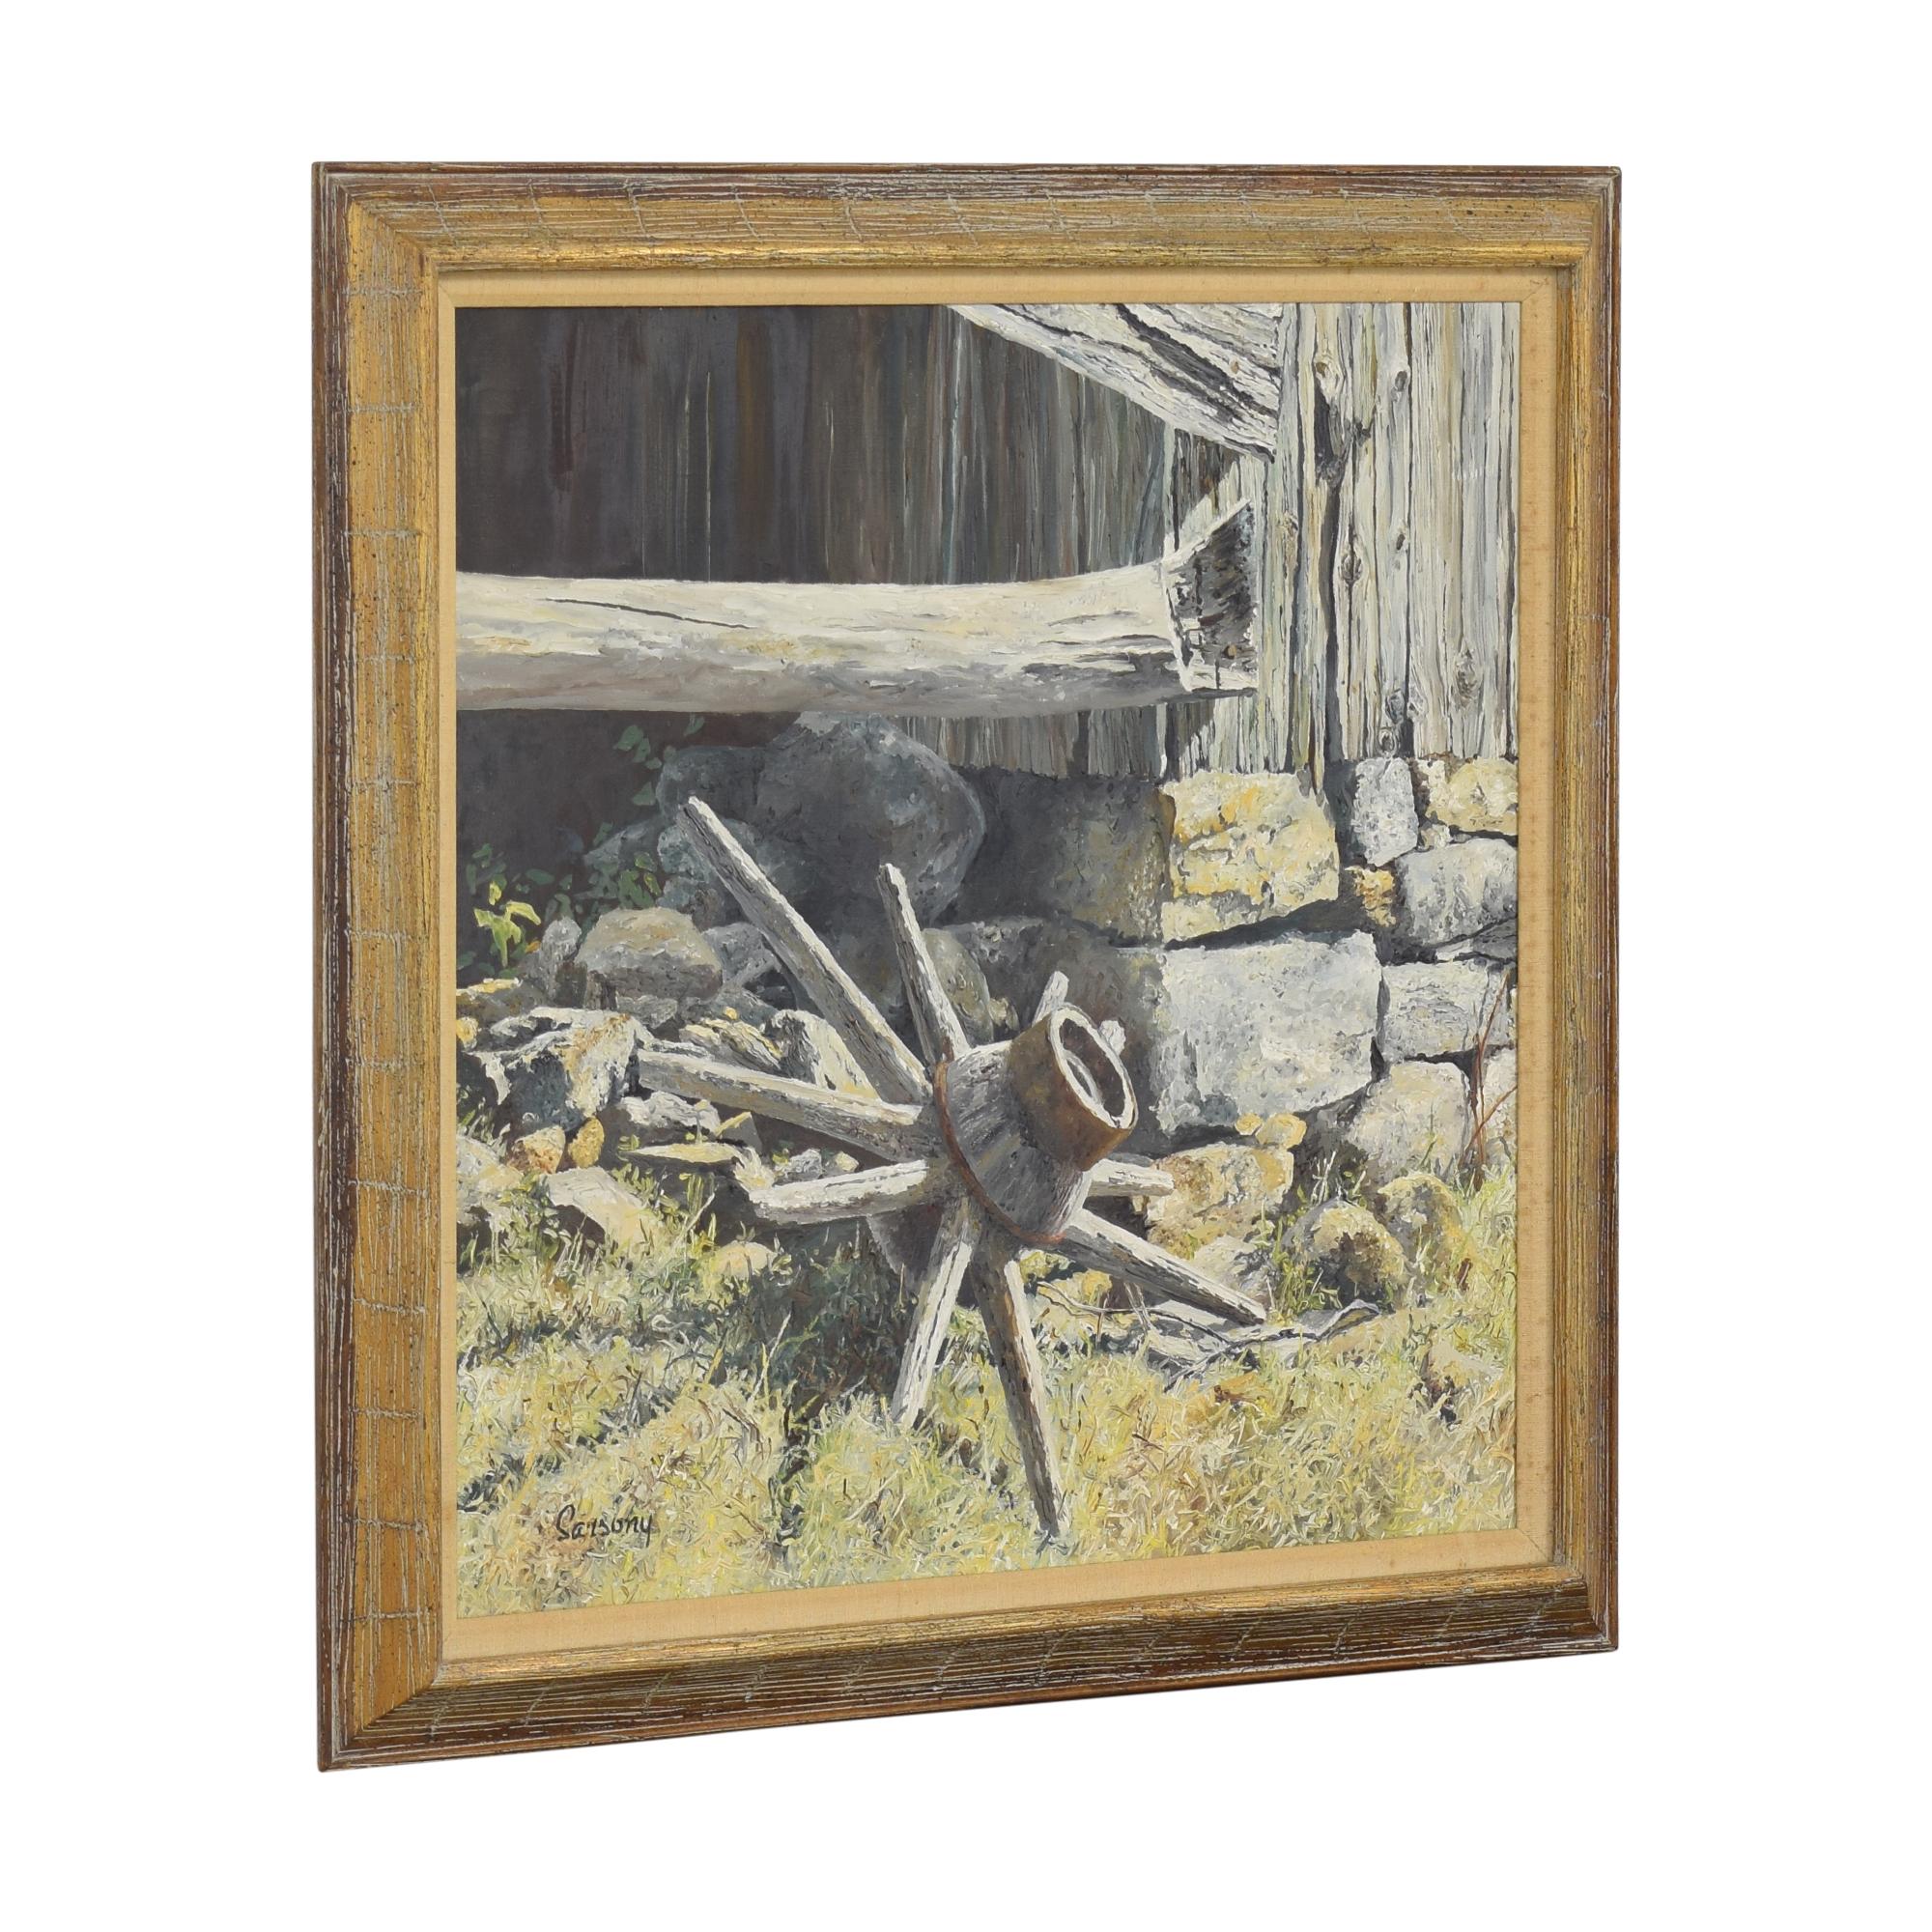 Robert Sarsony Wheel at the Barn Corner Framed Wall Art sale